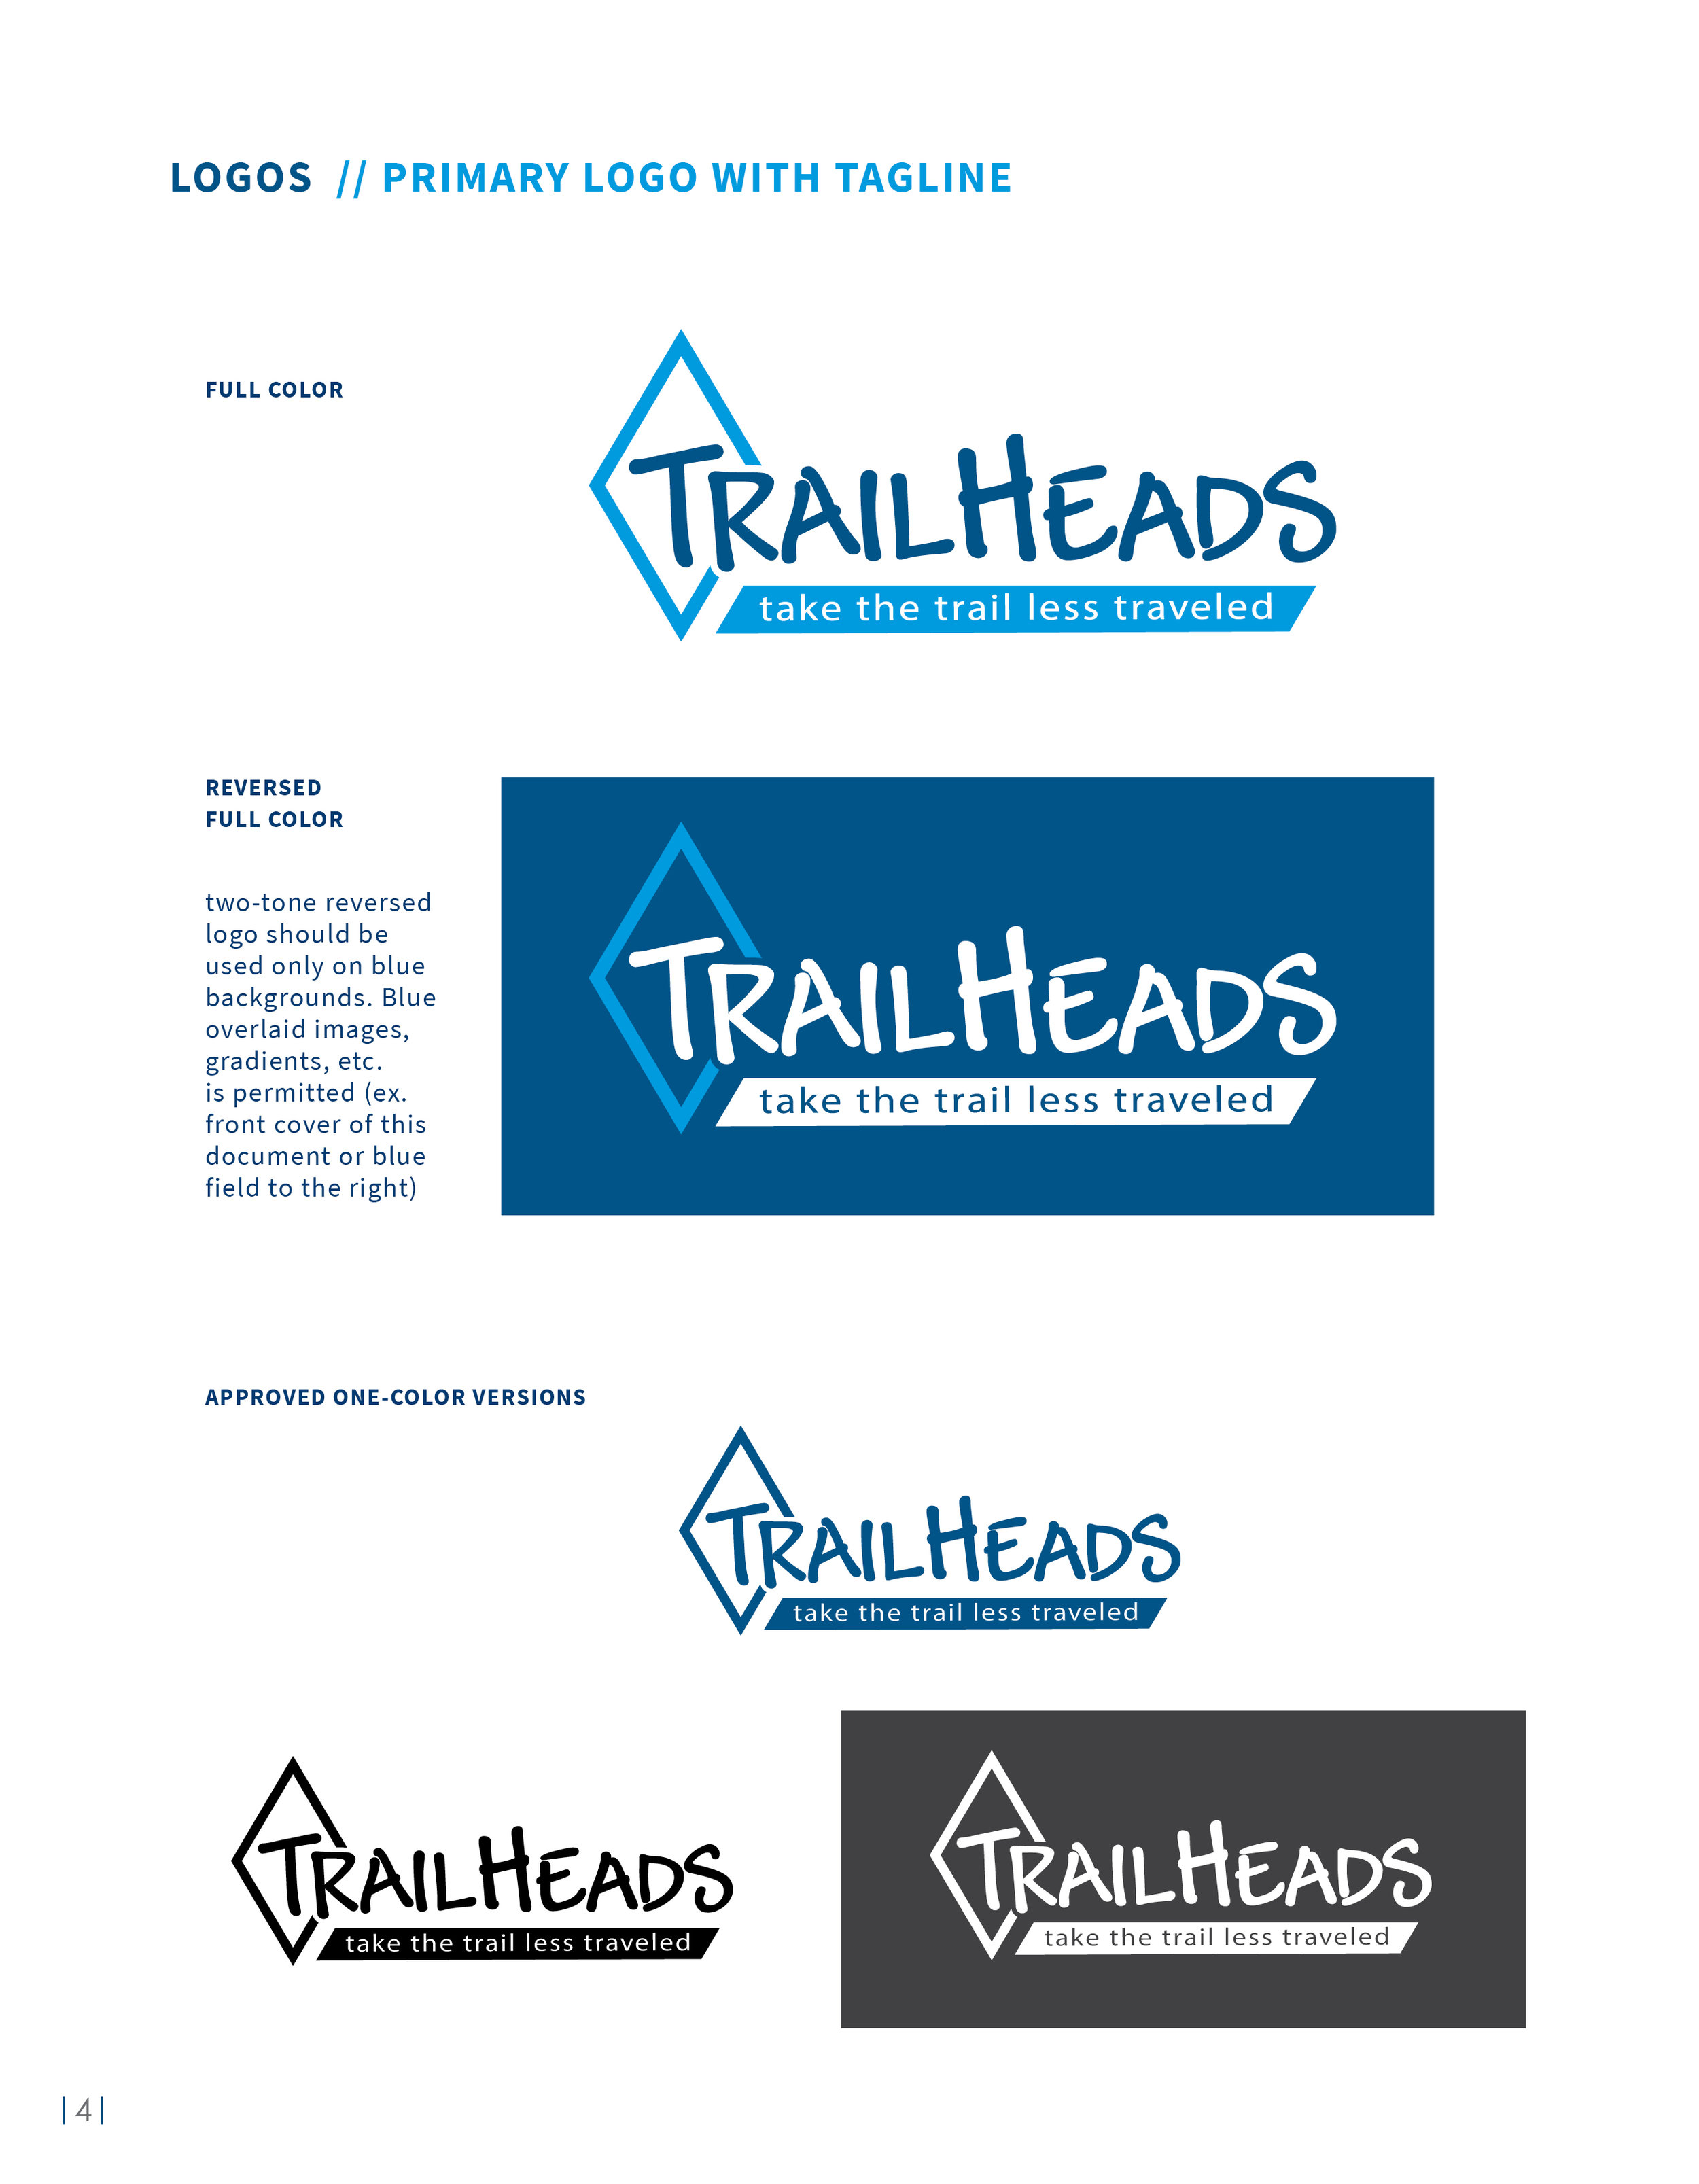 apparel-company-brand-guidelines-design-by-jordan-fretz-design-14.jpg